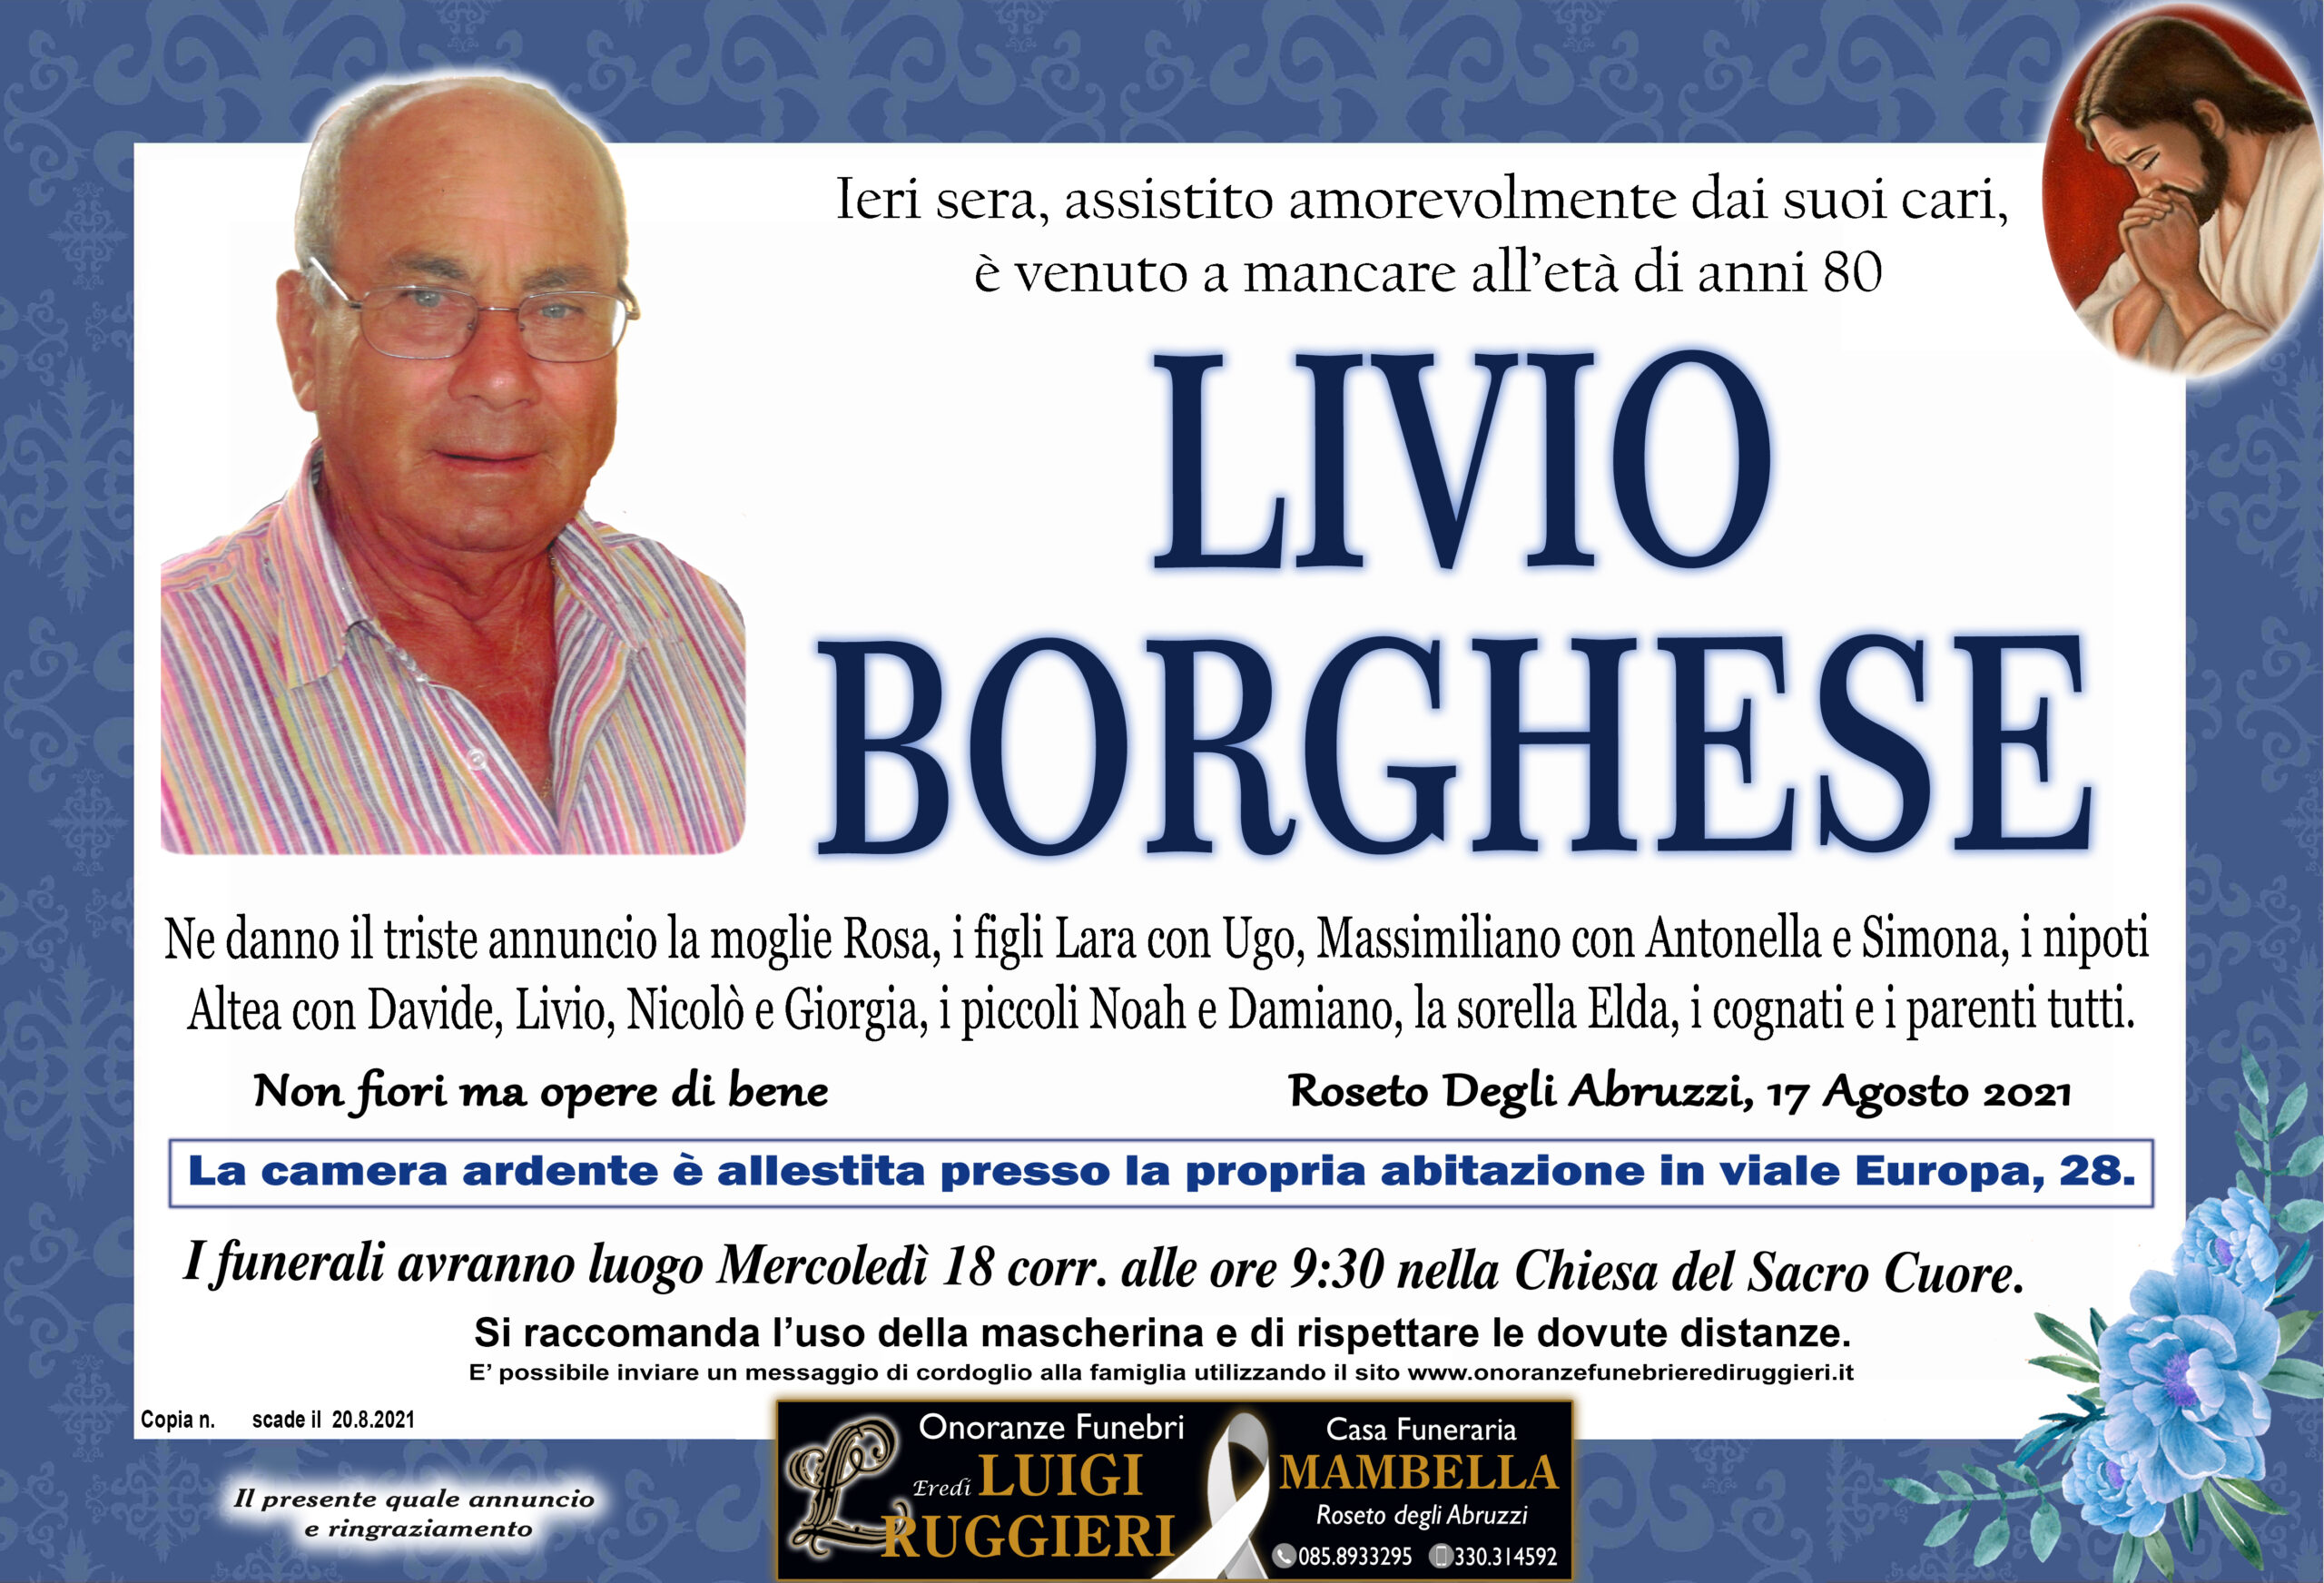 Livio Borghese